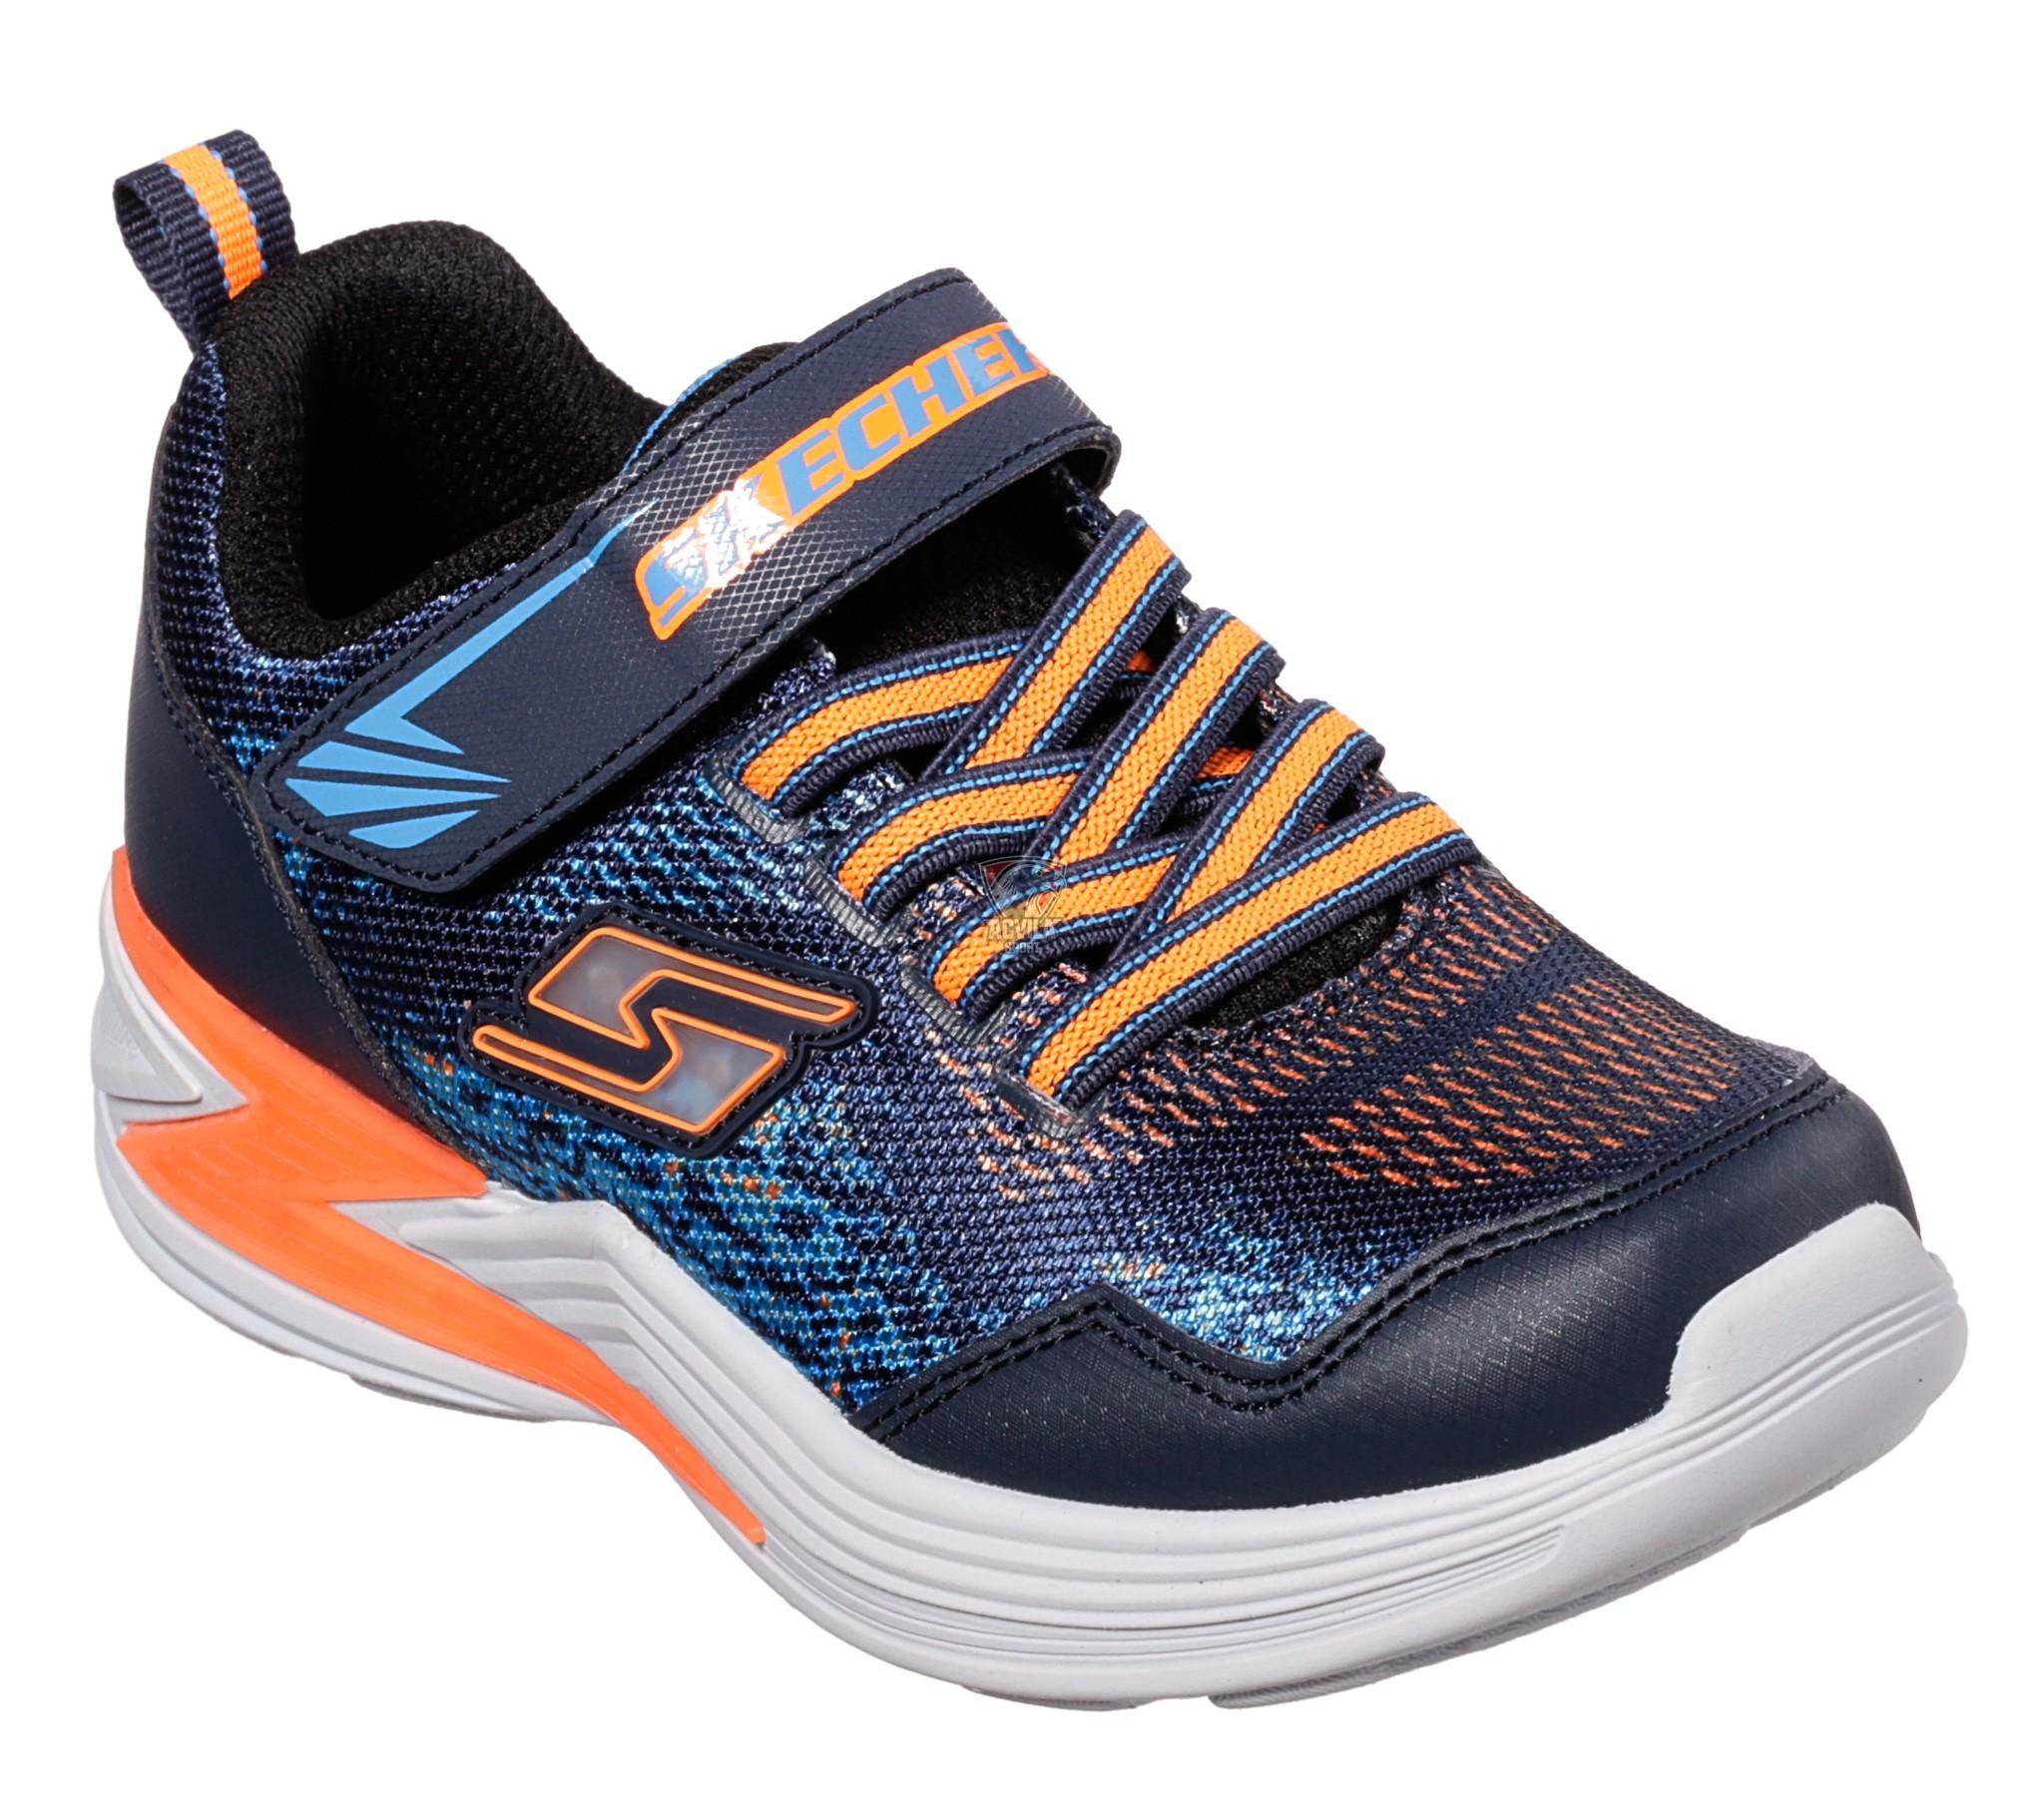 photo 12 Спортивная детская обувь SKECHERS ERUPTERS III DERLO